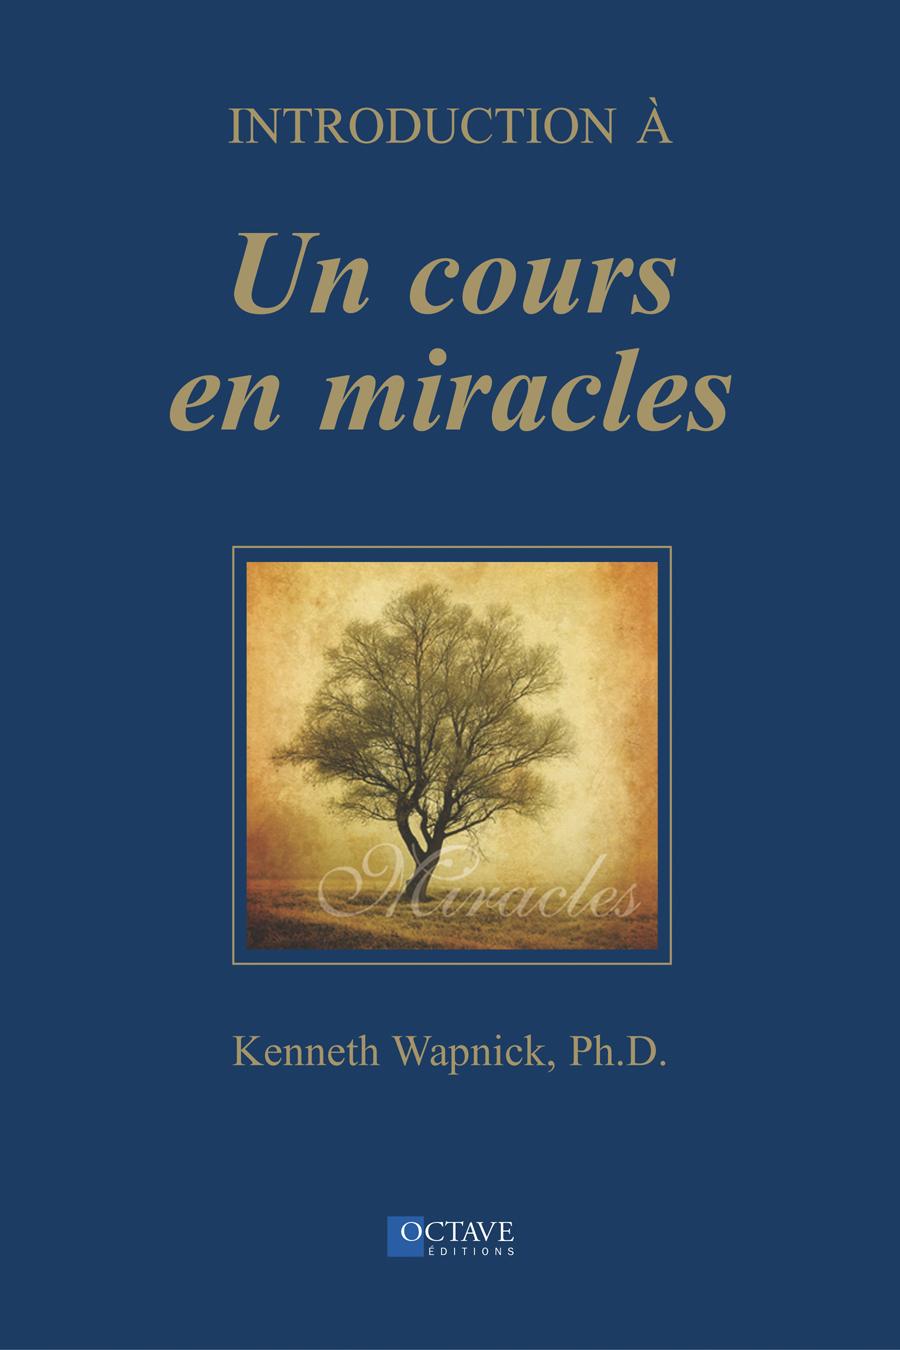 INTRODUCTION À UN COURS EN MIRACLES <i>Kenneth Wapnick</i>